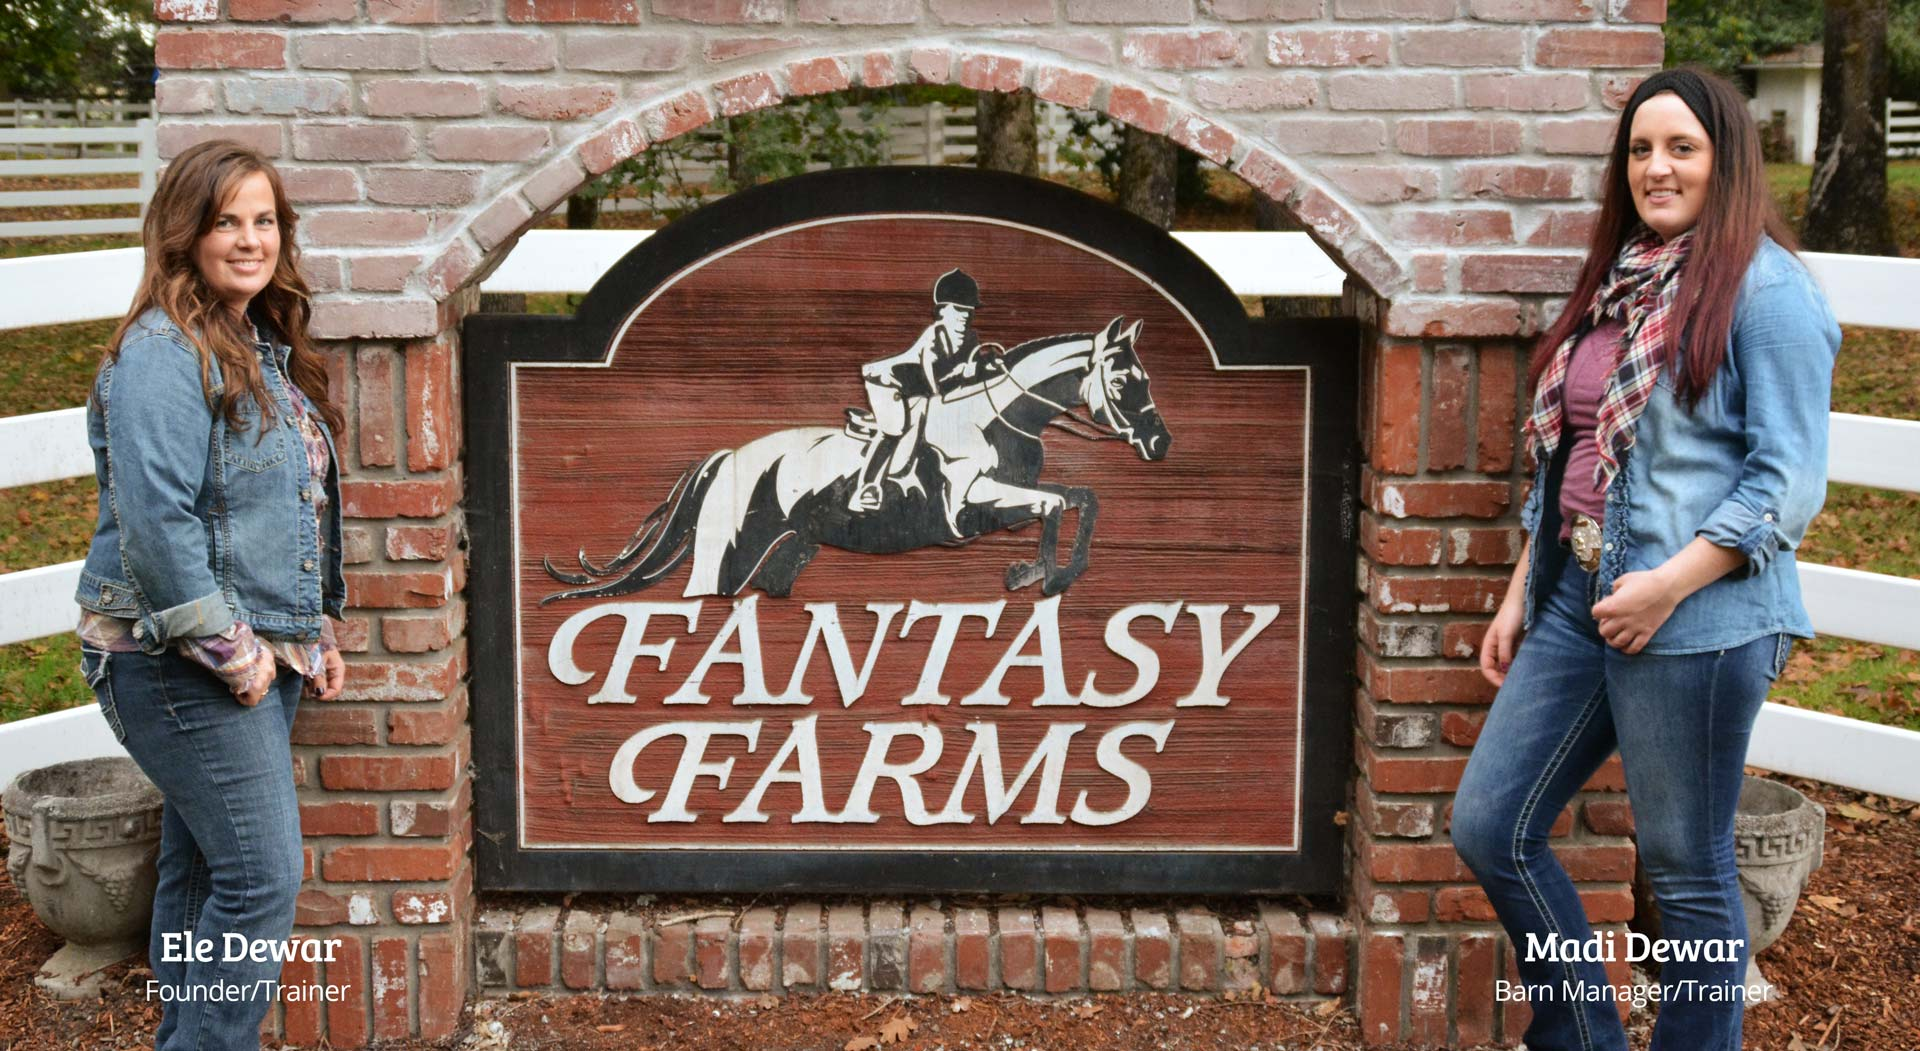 Ele Dewar and Madi Dewar standing in front of Fantasy Farms in Turner Oregon